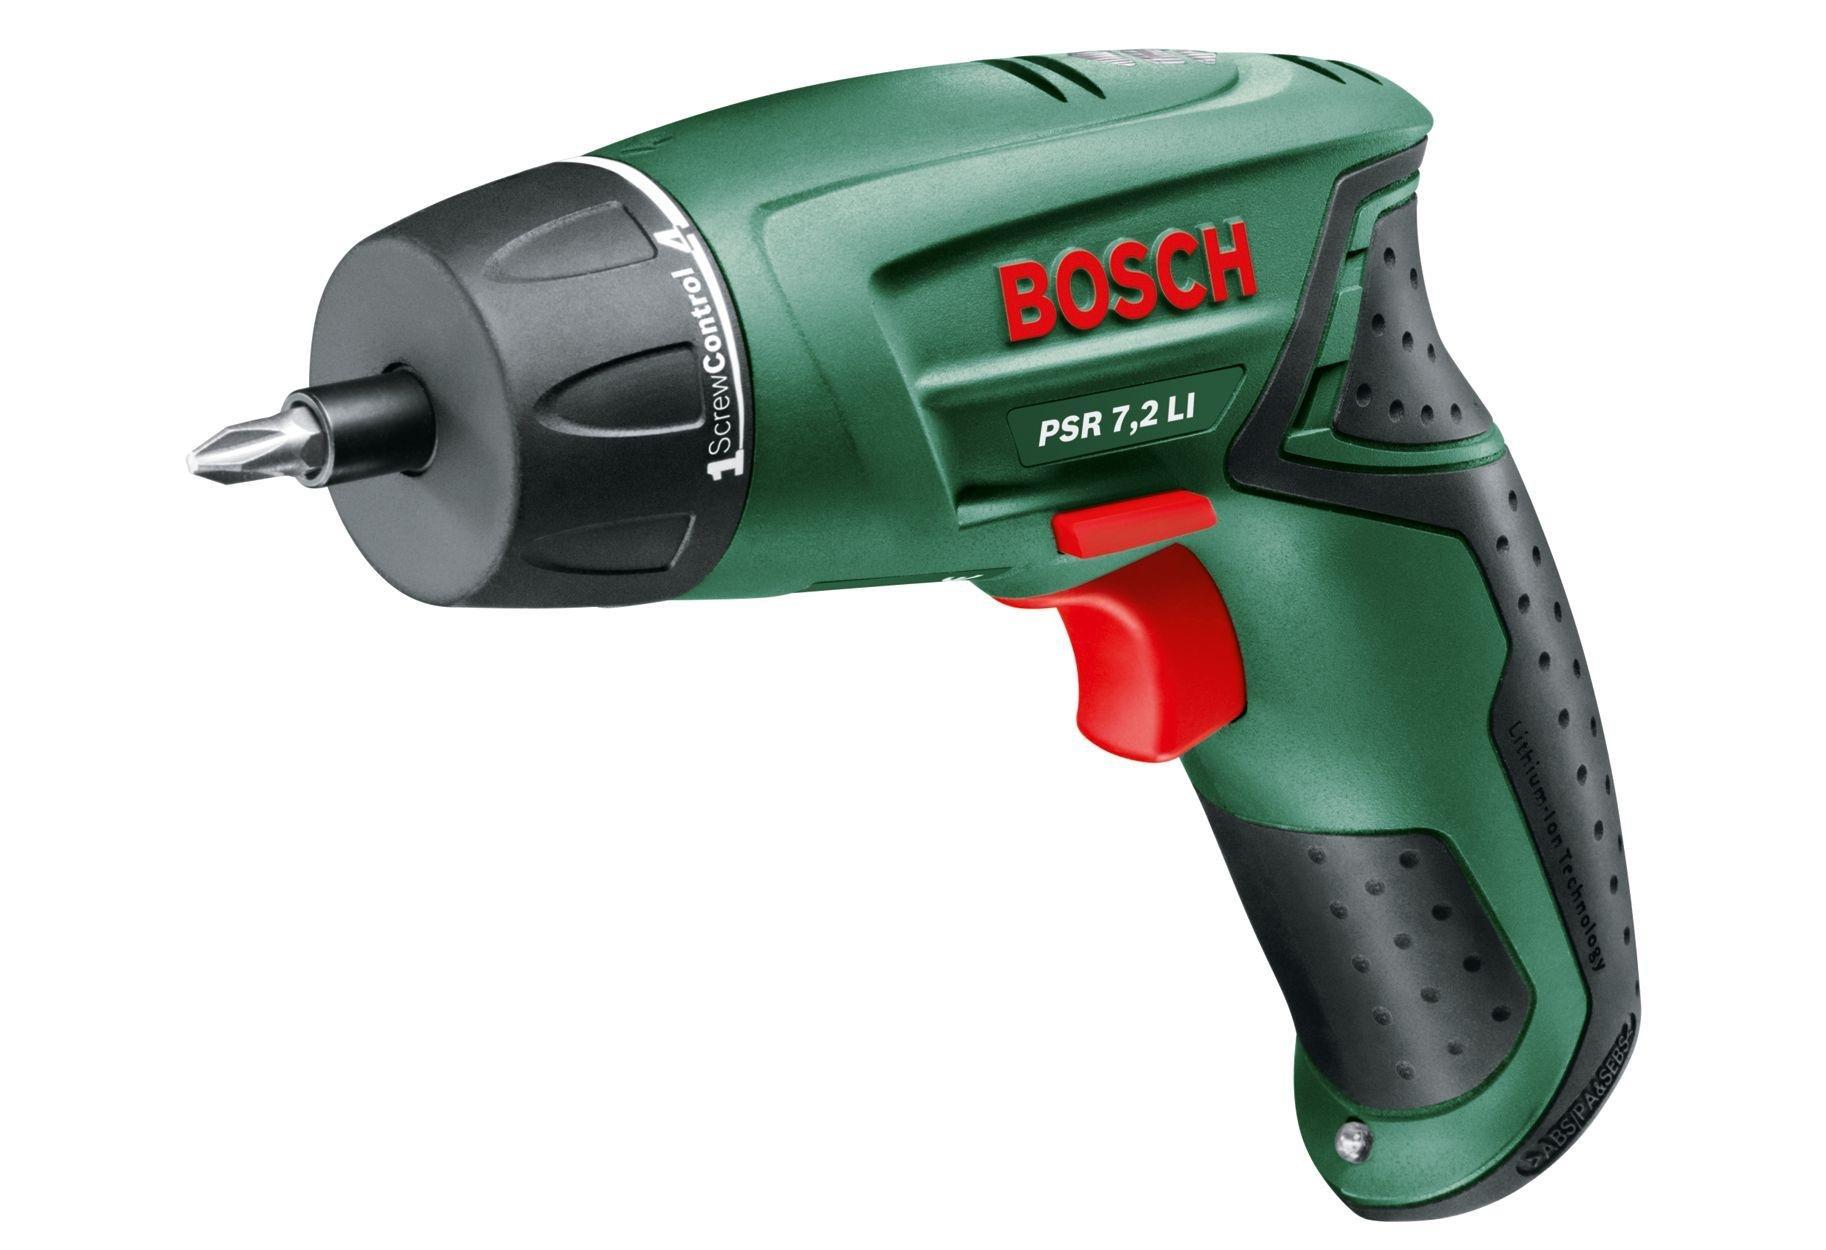 Bosch - PSR 7 2LI Cordless Screwdriver - 72V/13Ah lowest price